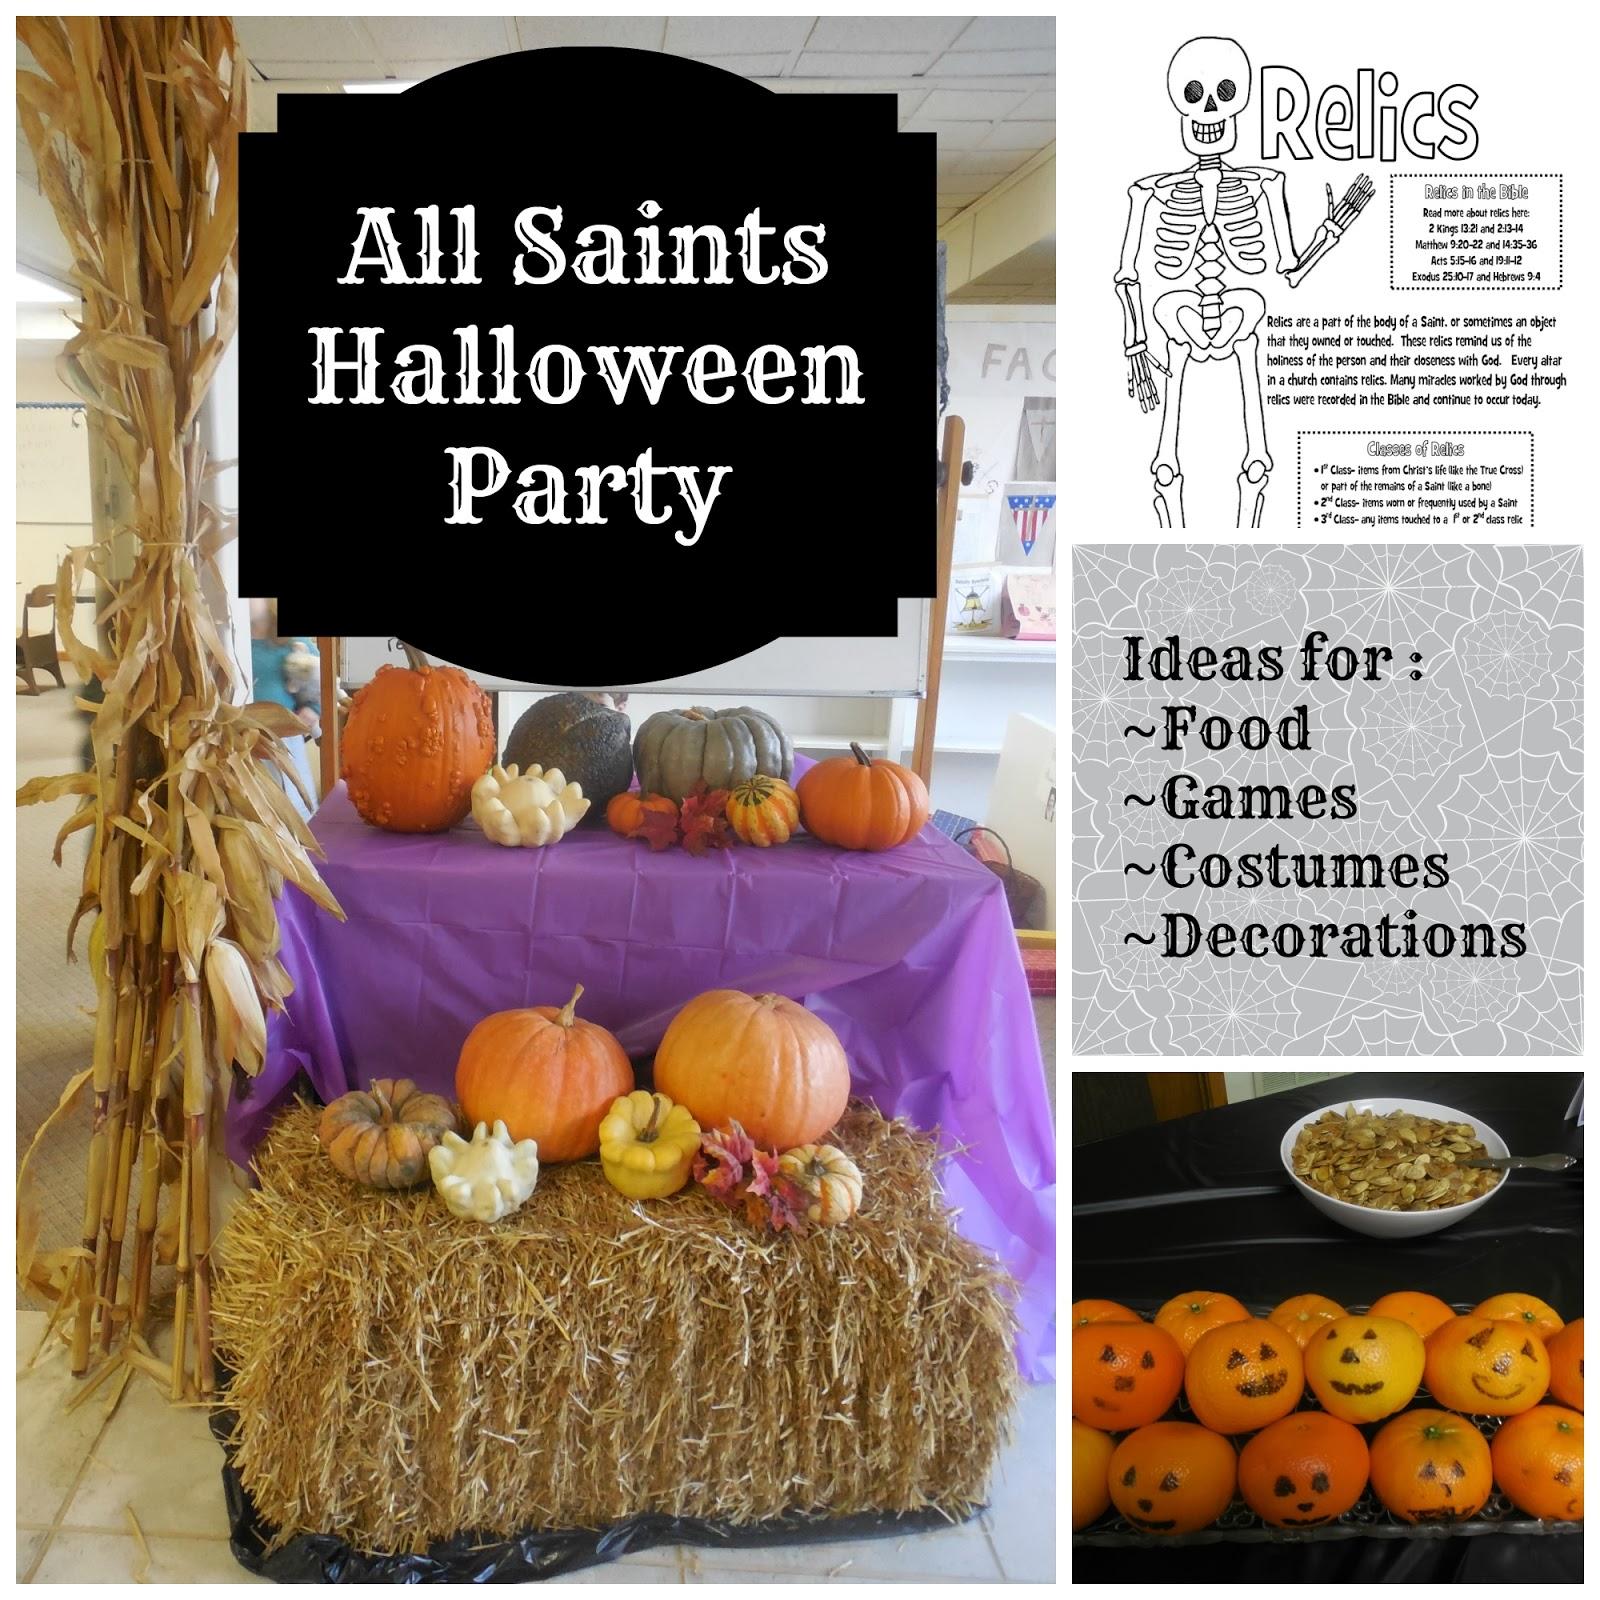 All Saints' Halloween party